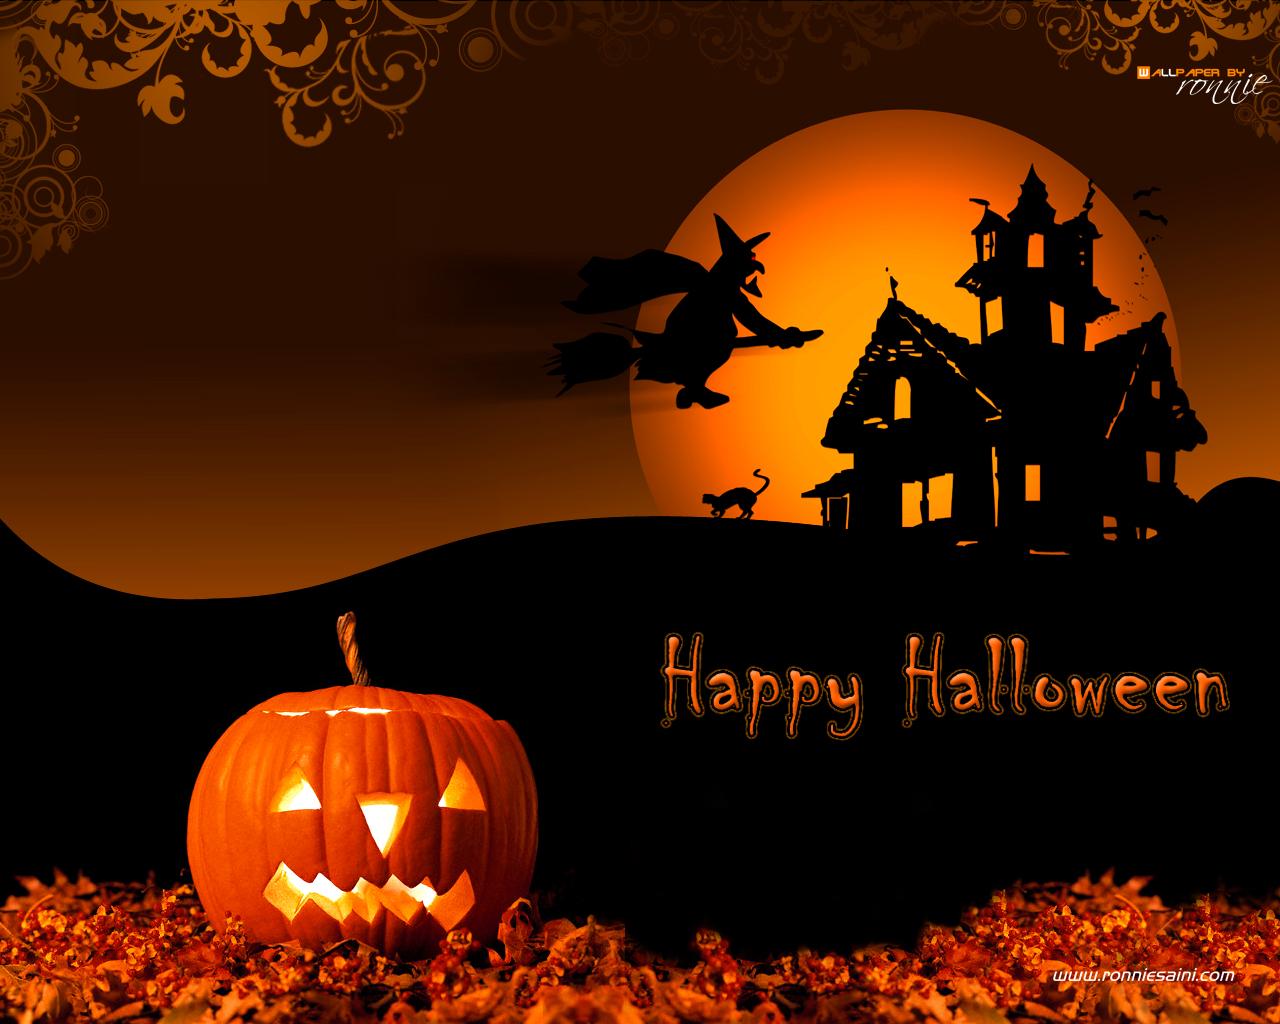 http://2.bp.blogspot.com/-UyS8P6VKjWU/Tq189WWloLI/AAAAAAAAIv8/EmuR0ekzLyw/s1600/happy_halloween_28938.jpg